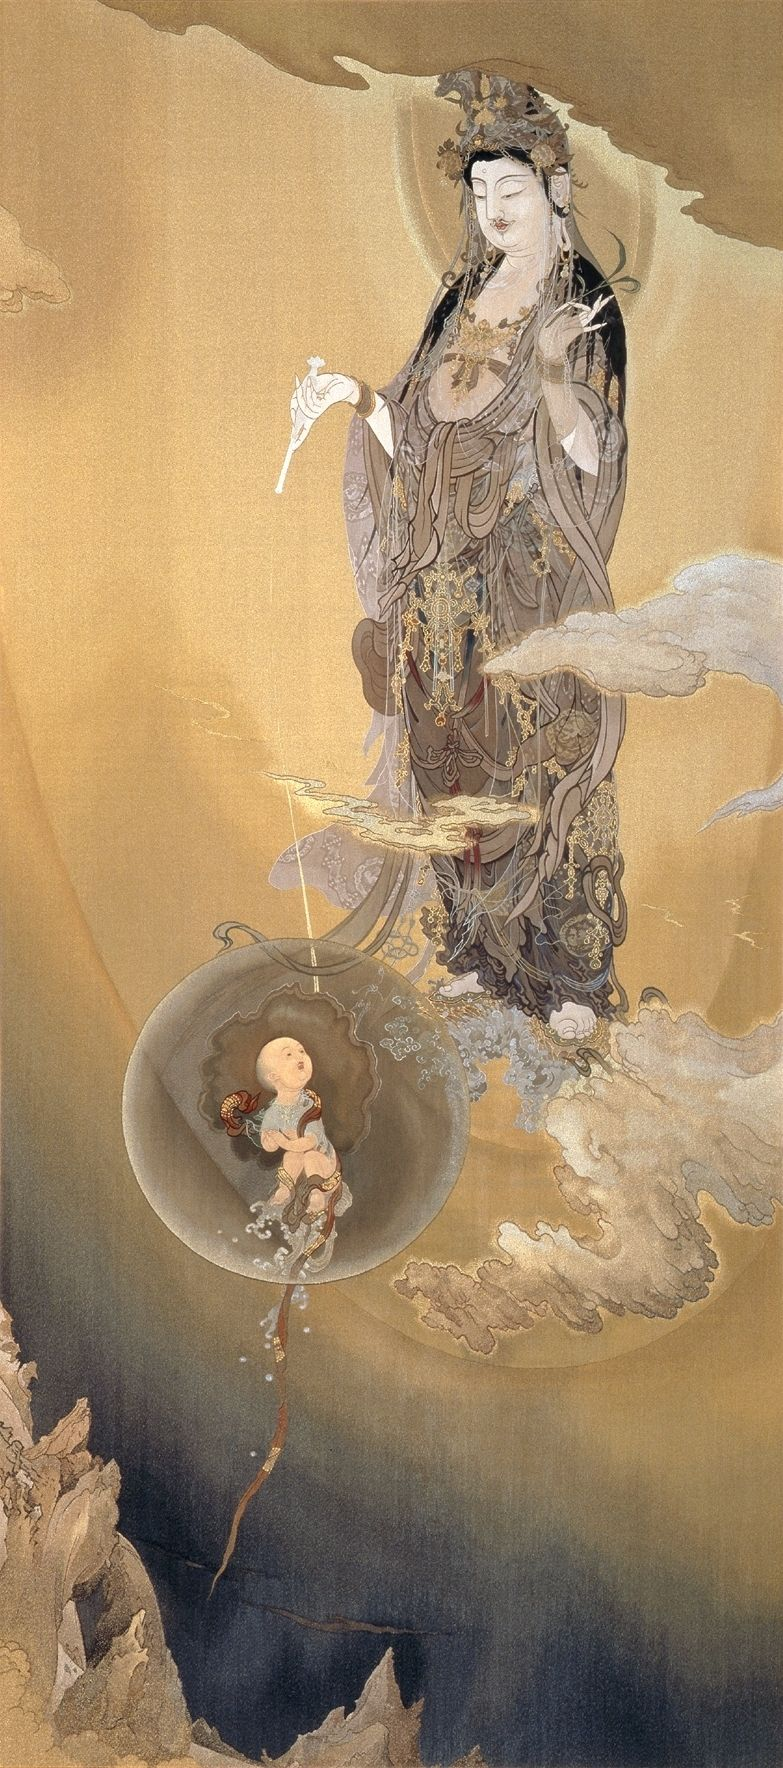 狩野芳崖の画像 p1_21